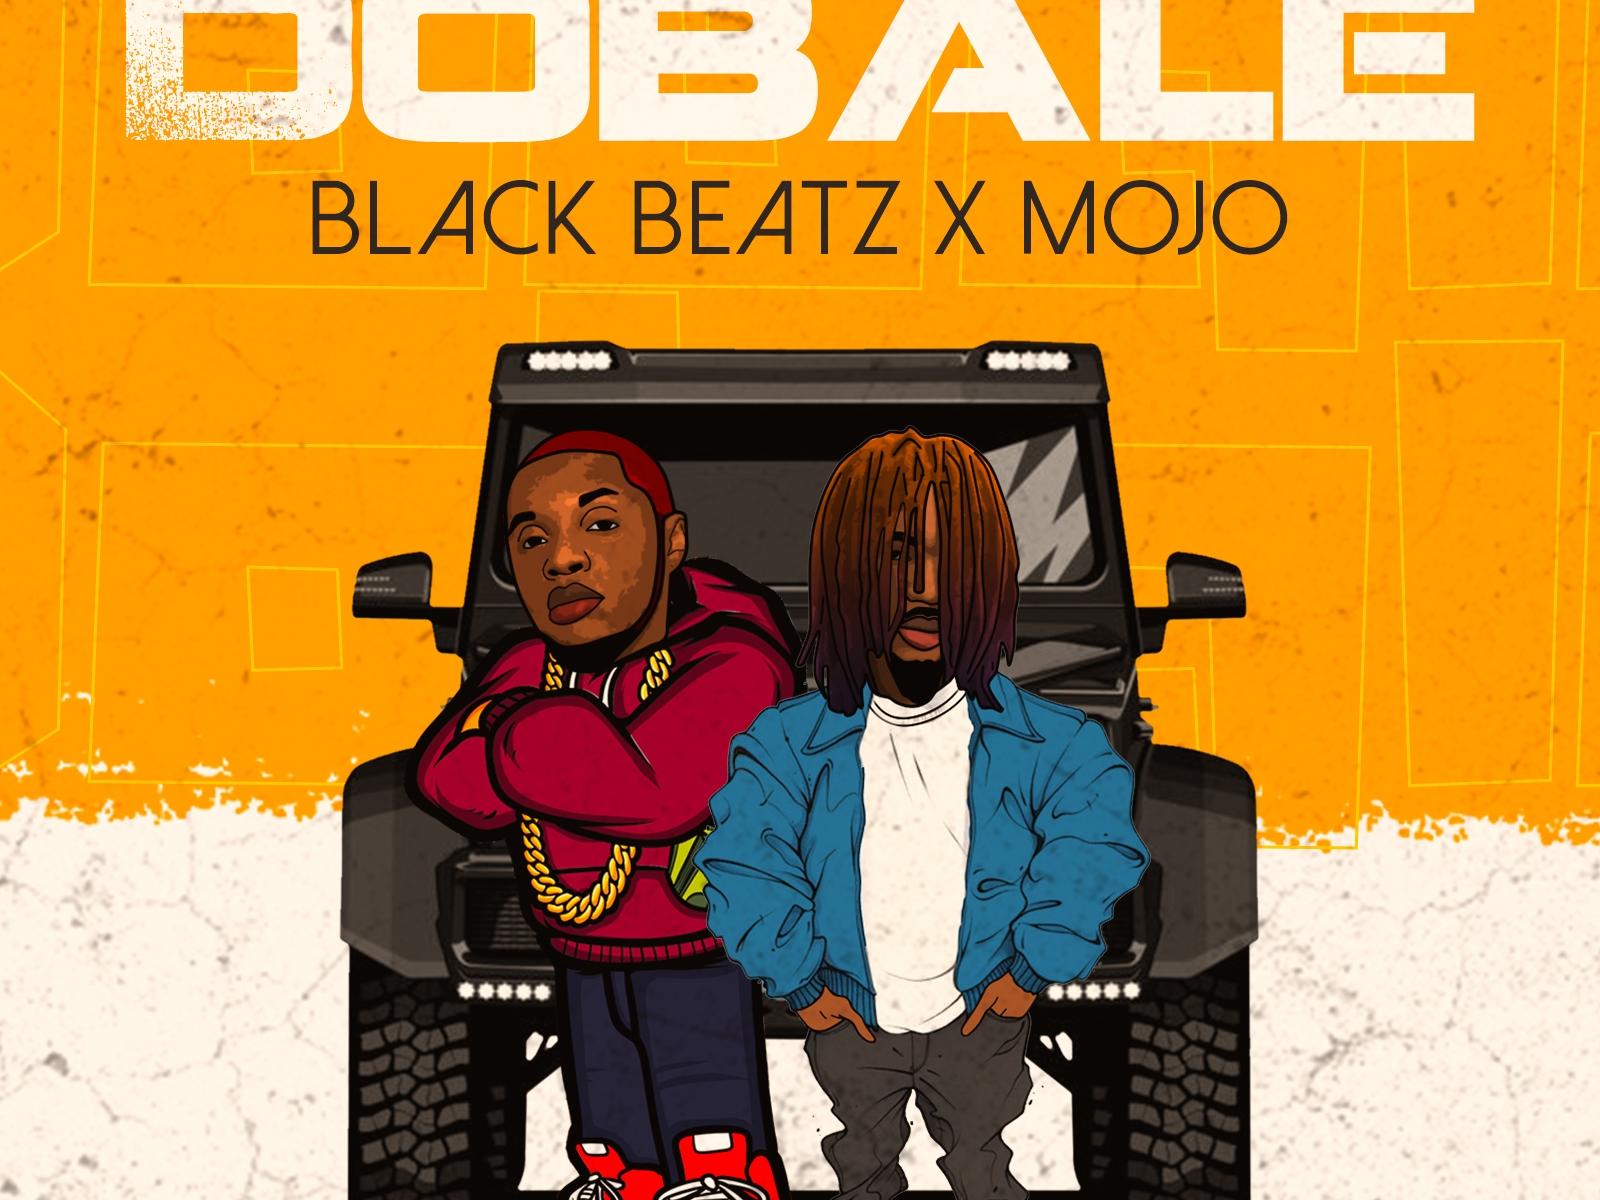 Black Beatz – Dobale featuring Mojo